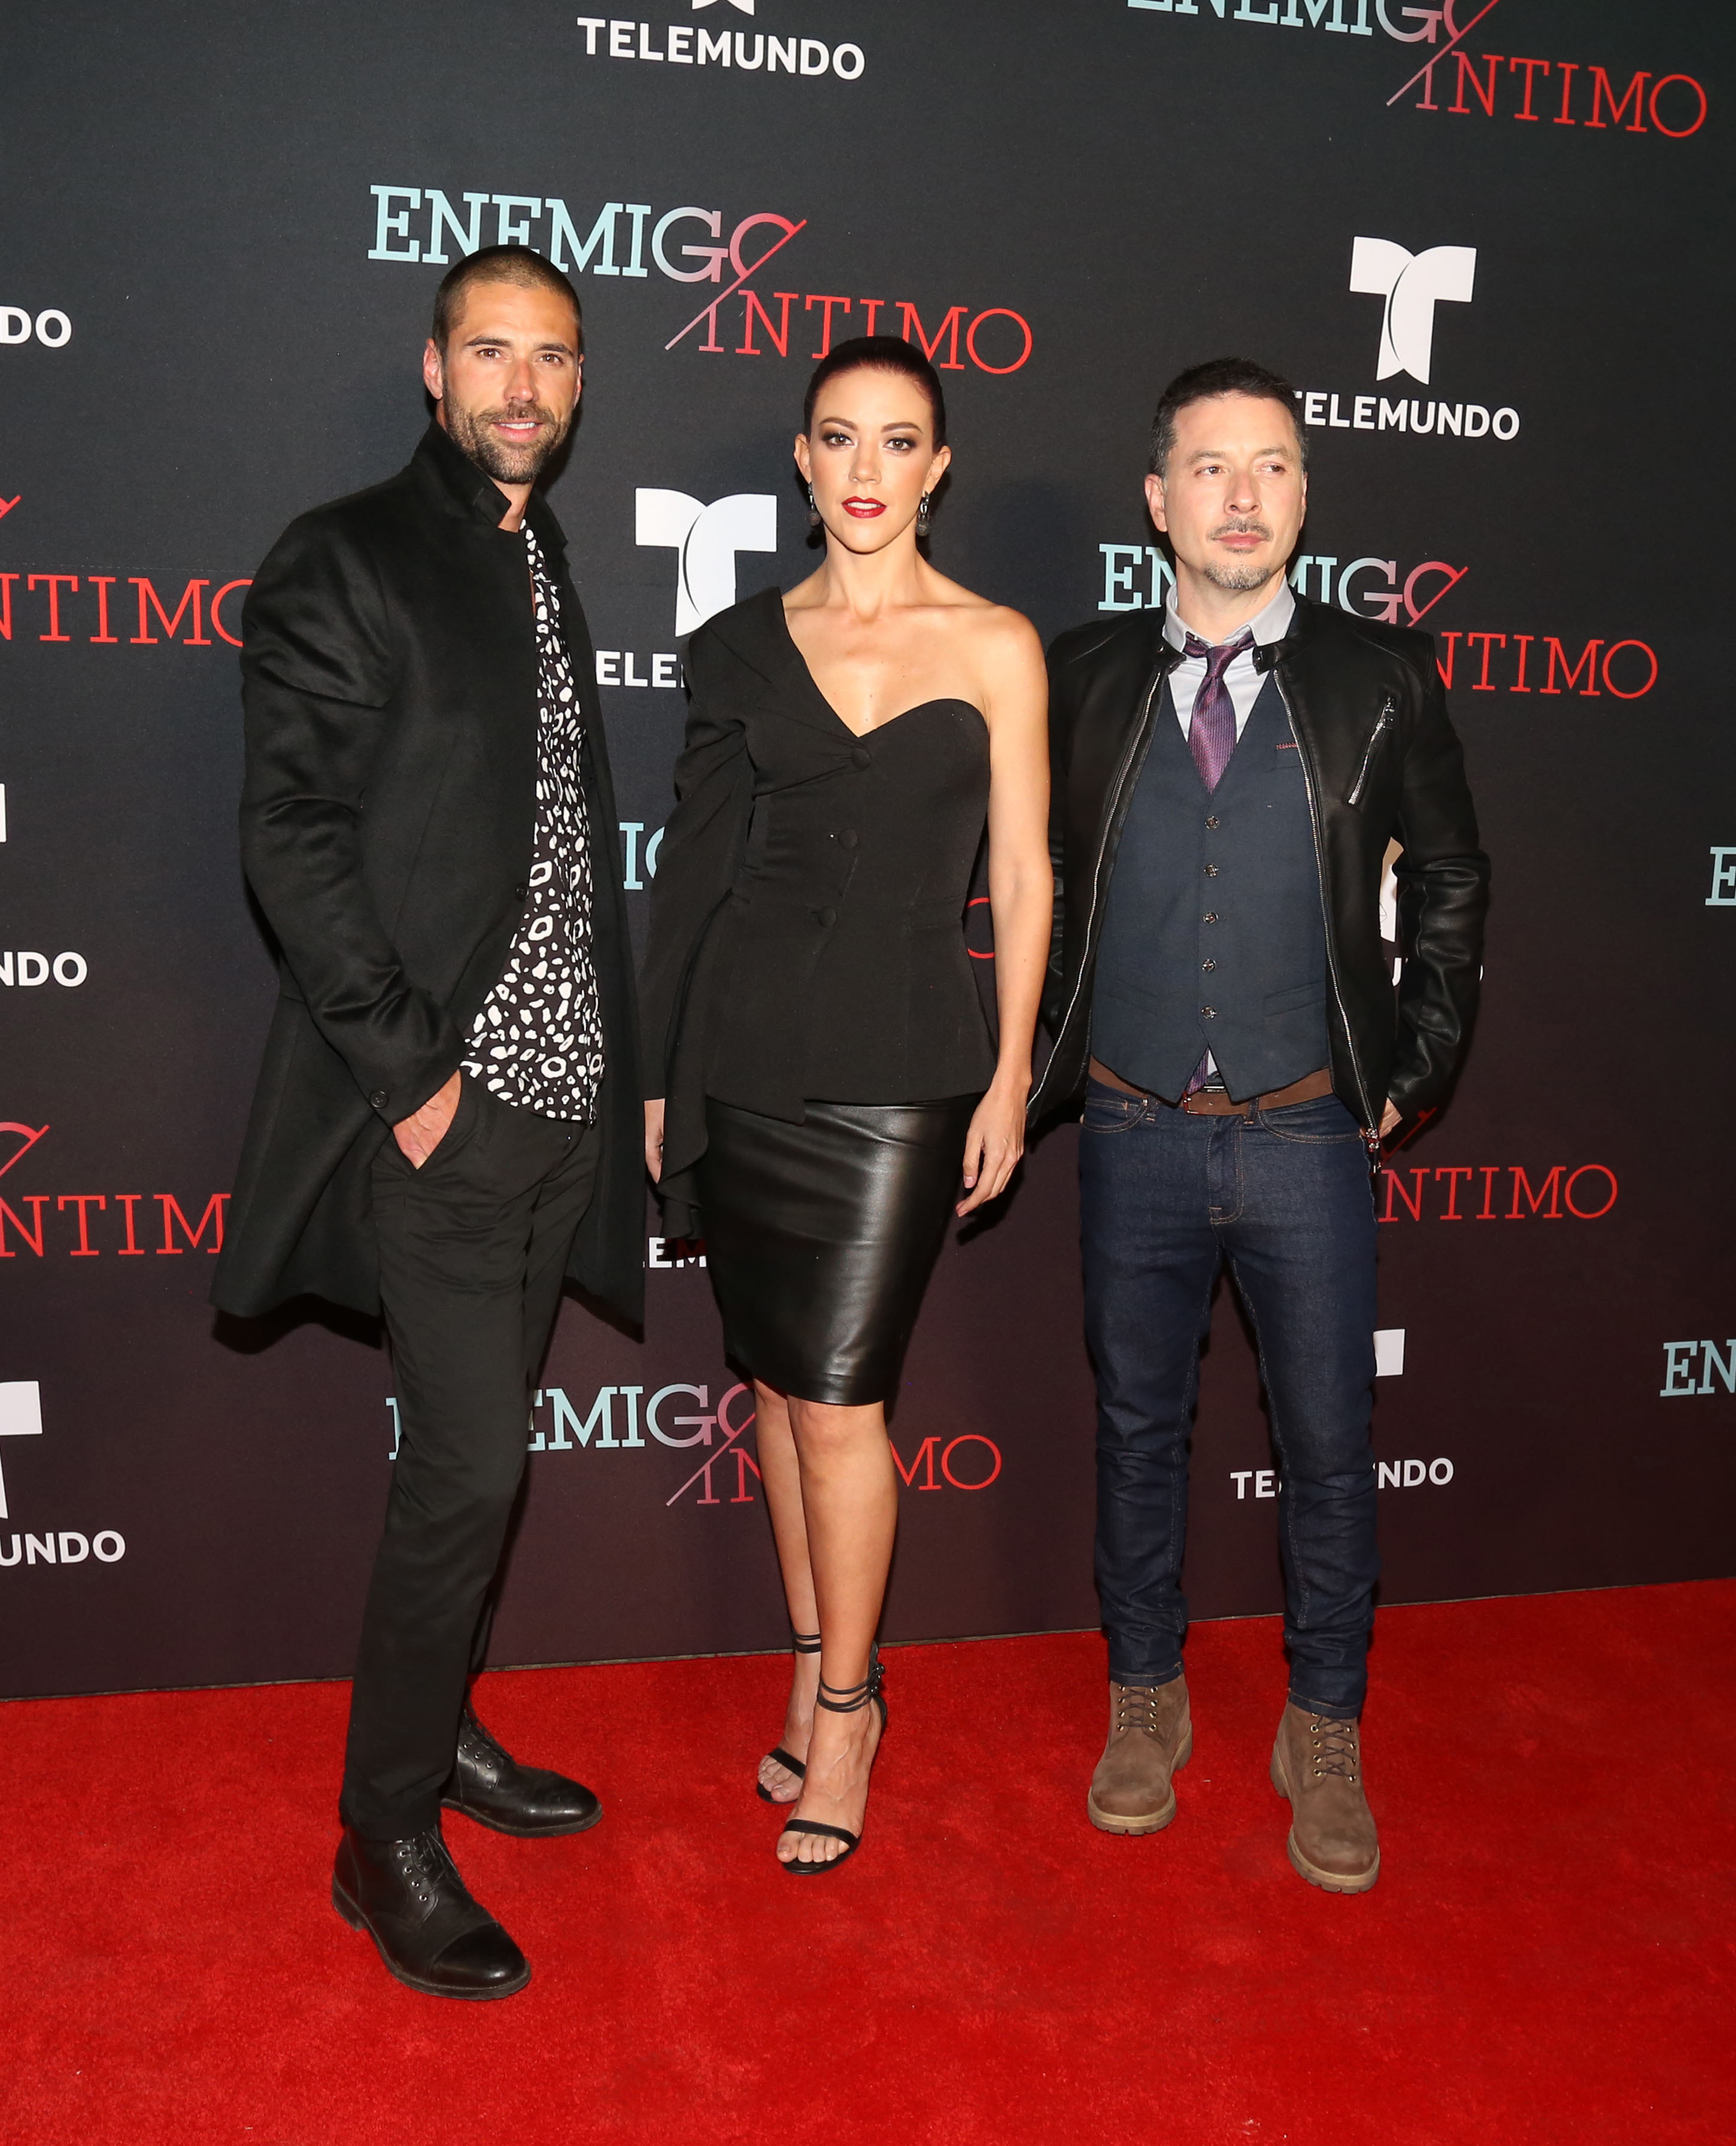 Matias Novoa, Fernanda Castillo, Raul Mendez